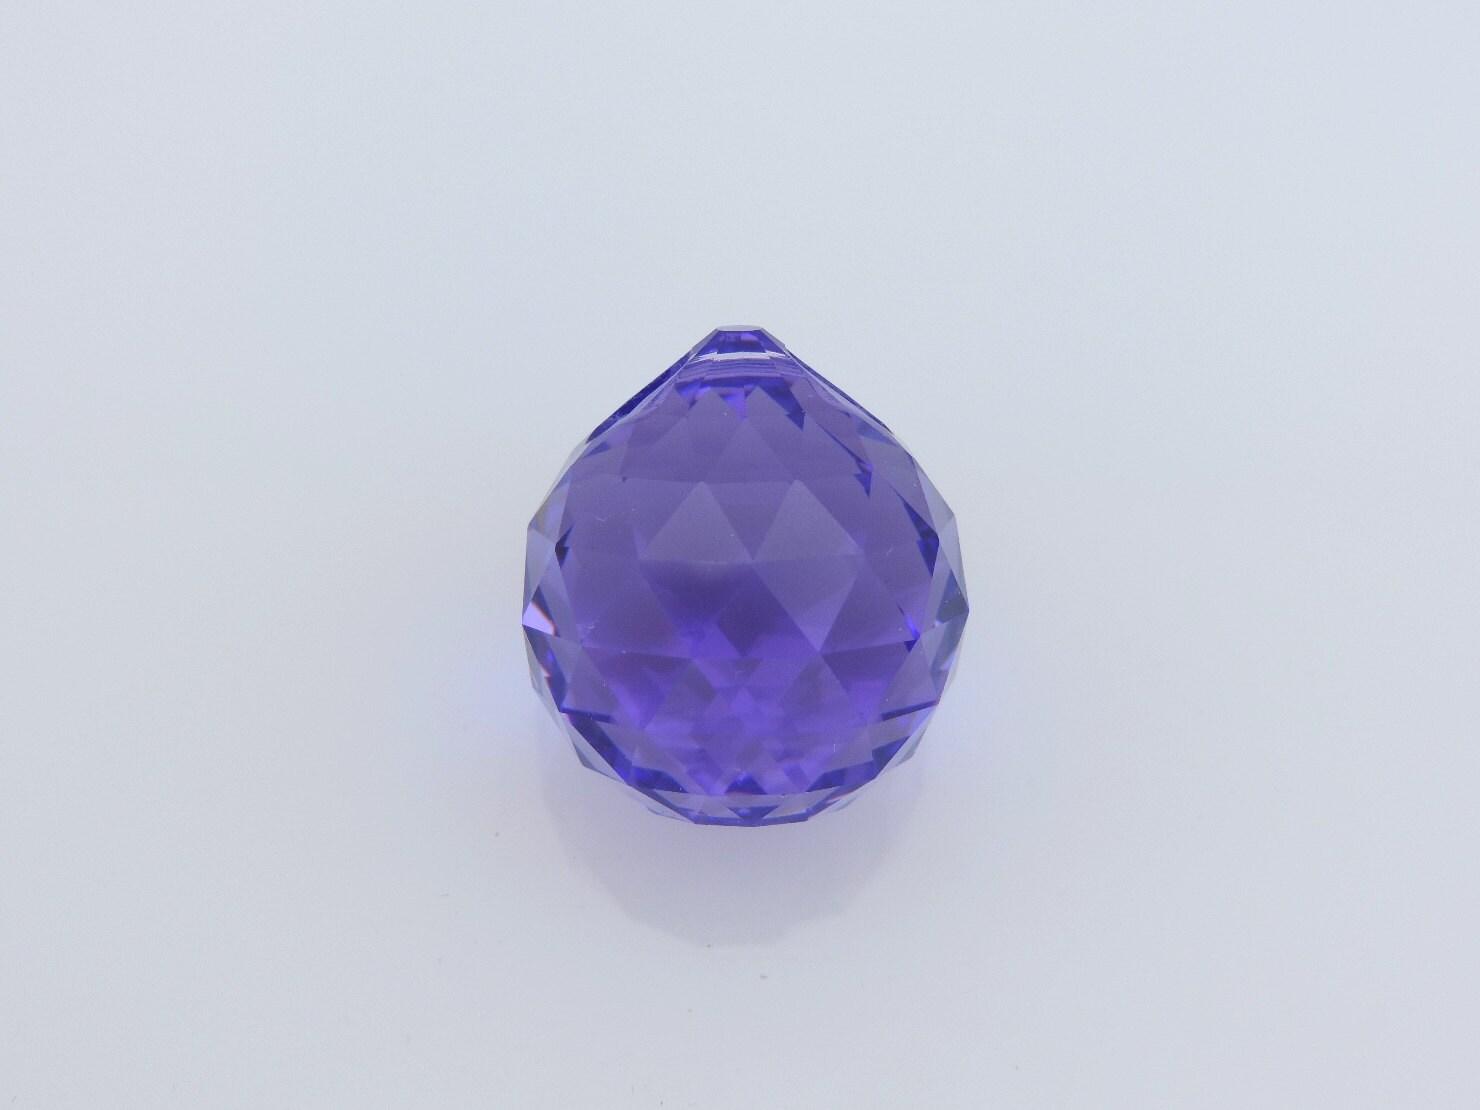 Swarovski Crystal Ball 20mm Prism One1purple Crystal Ball